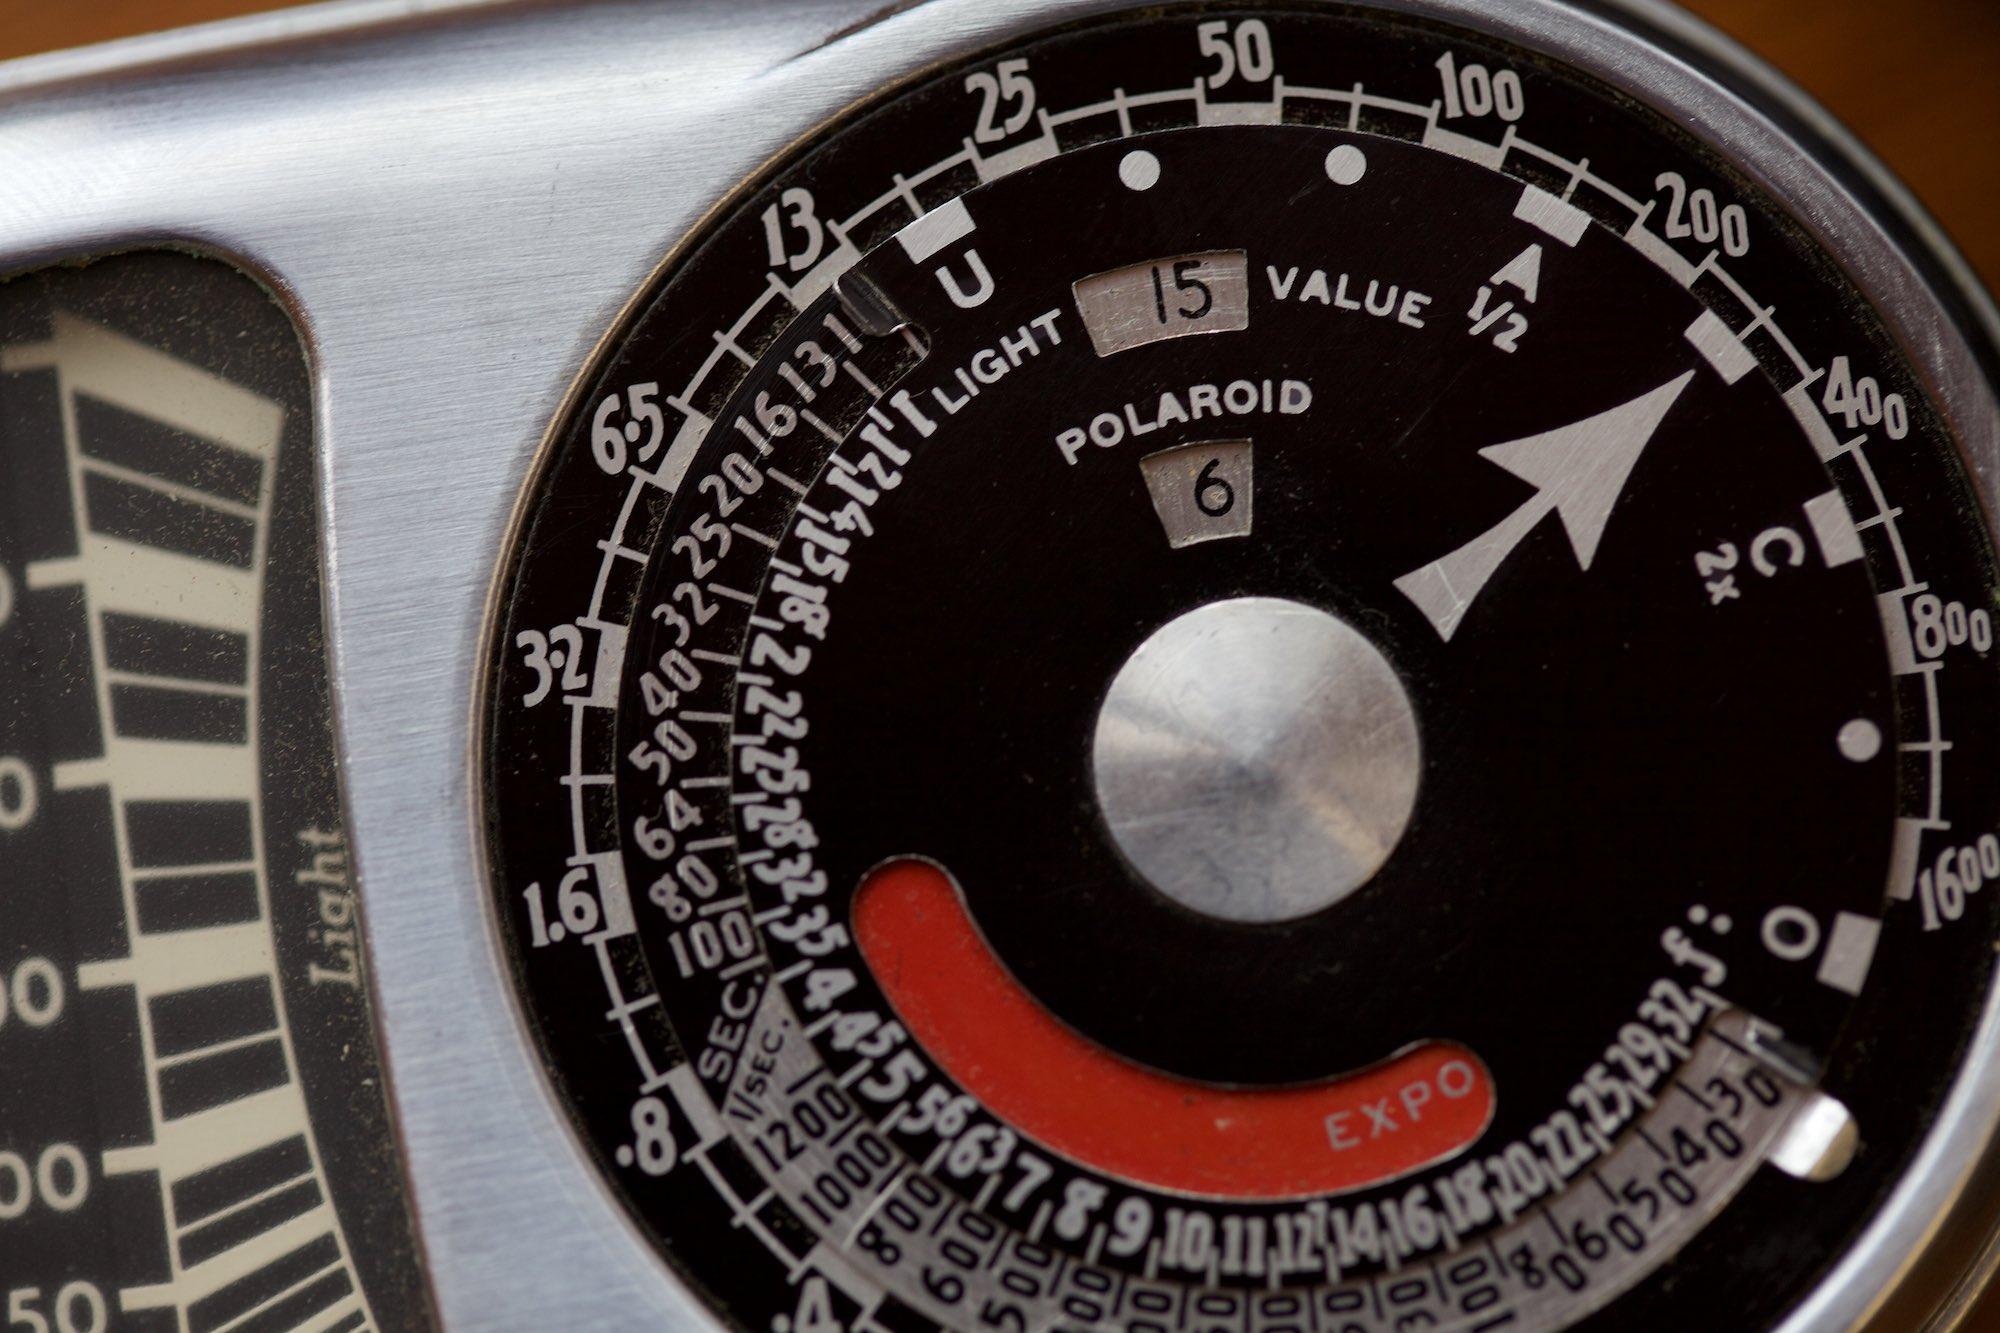 Weston exposure meter from 1950's